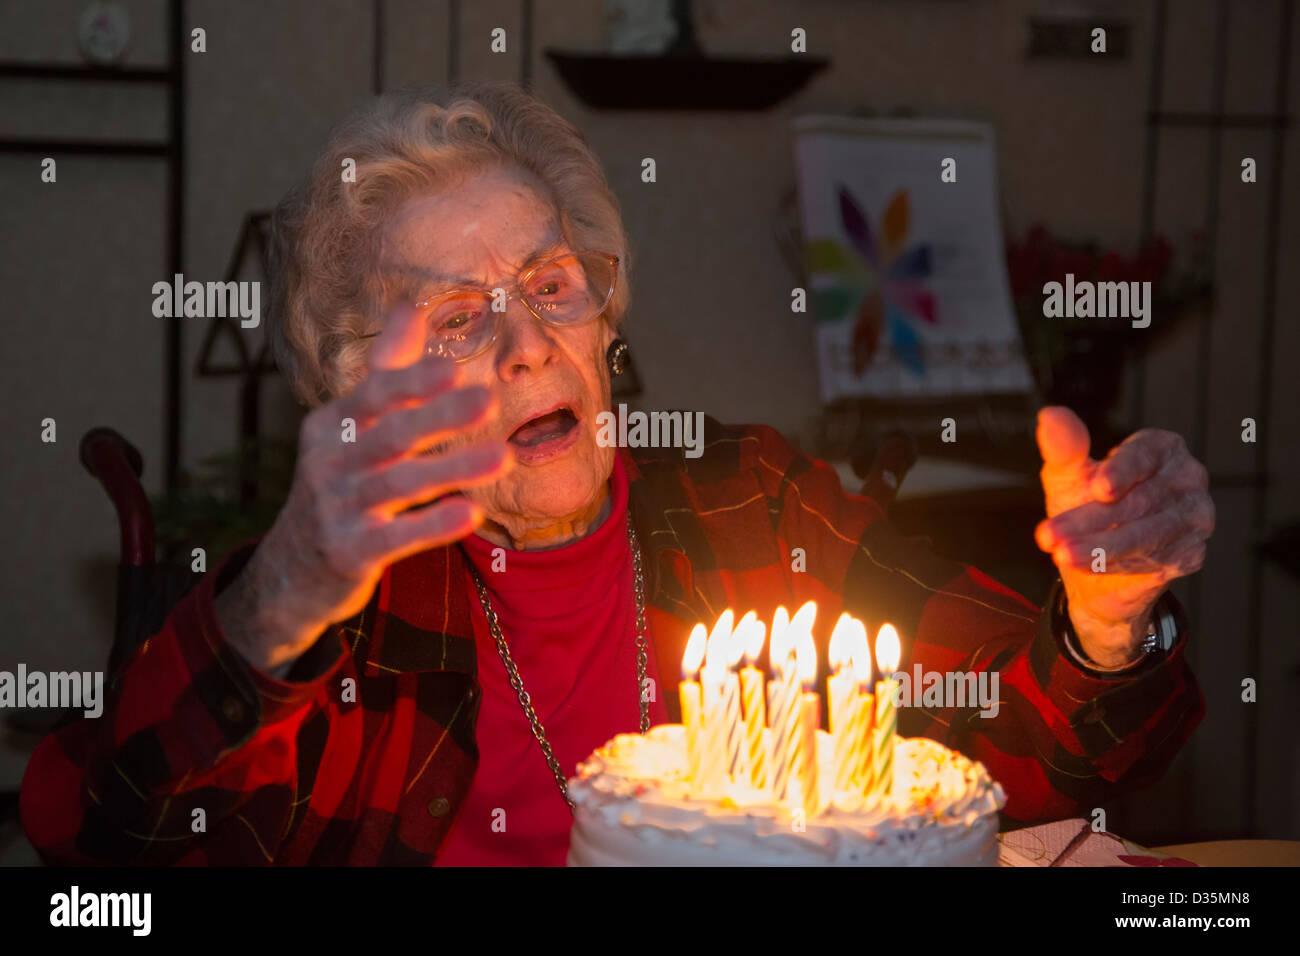 Sterling Heights, Michigan - Dorothy Newell feiert ihren 99. Geburtstag. Stockbild